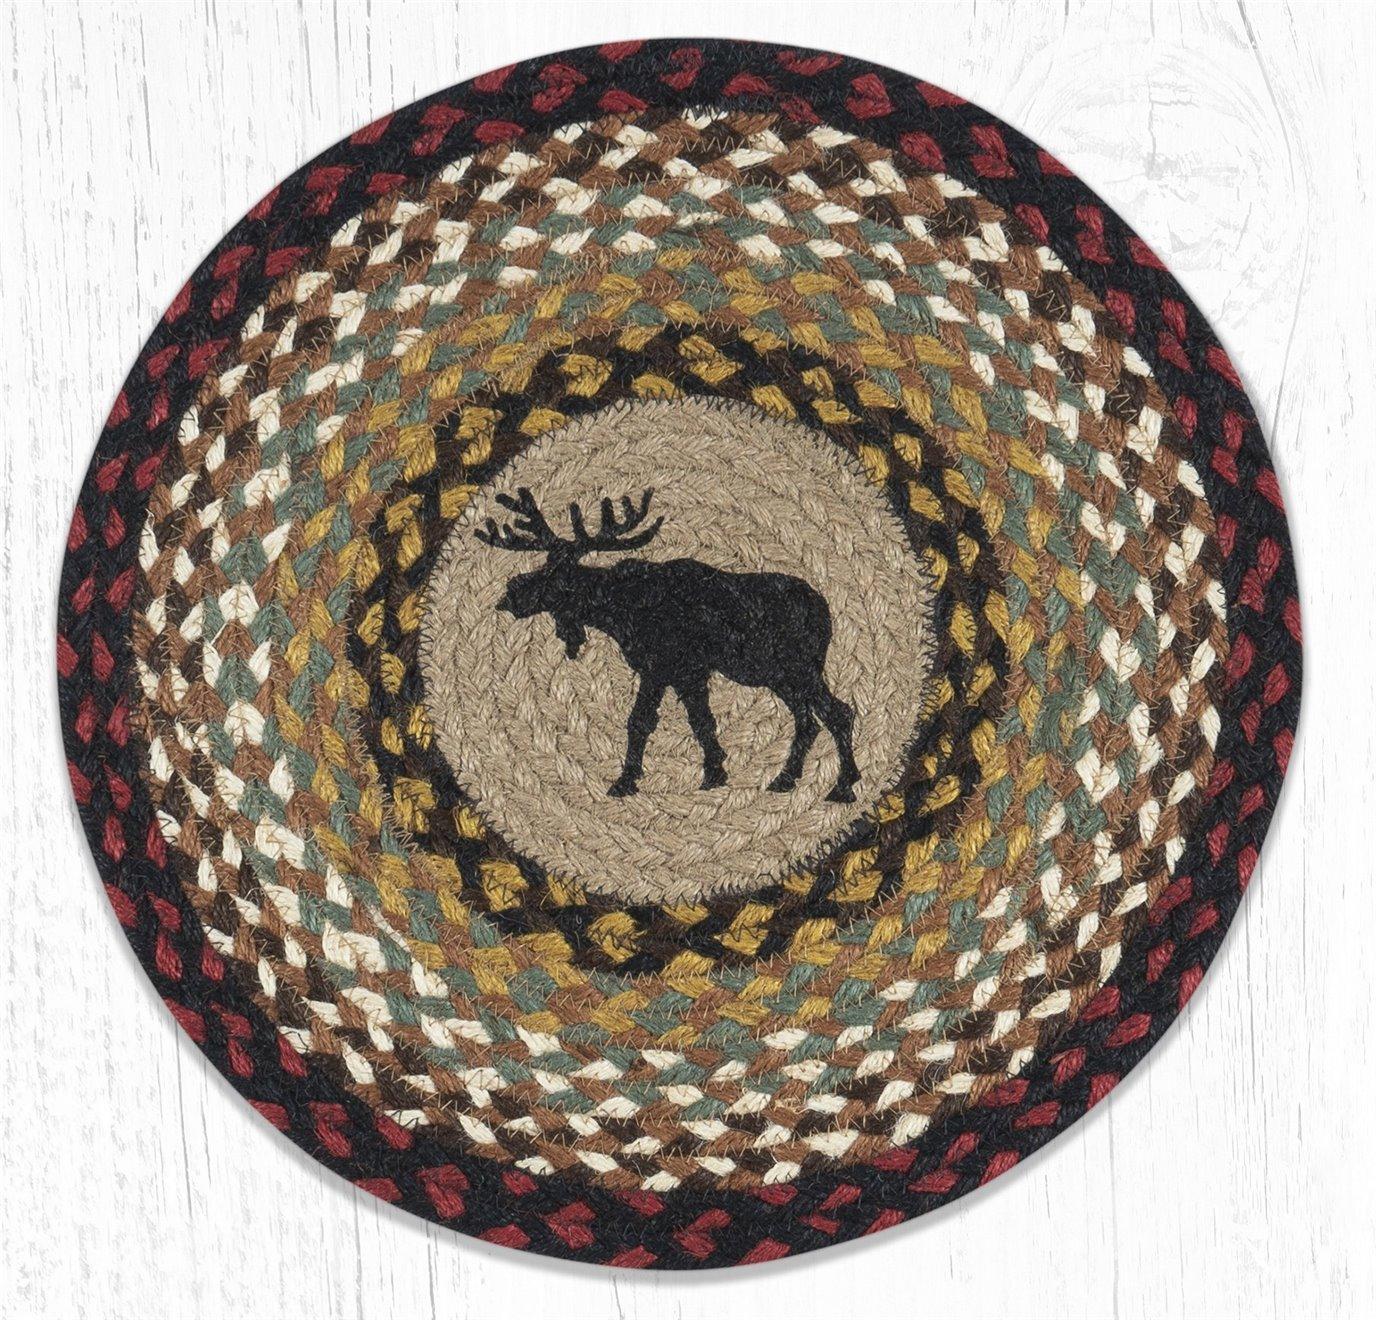 "Black Moose Printed Round Braided Placemat 15""x15"""